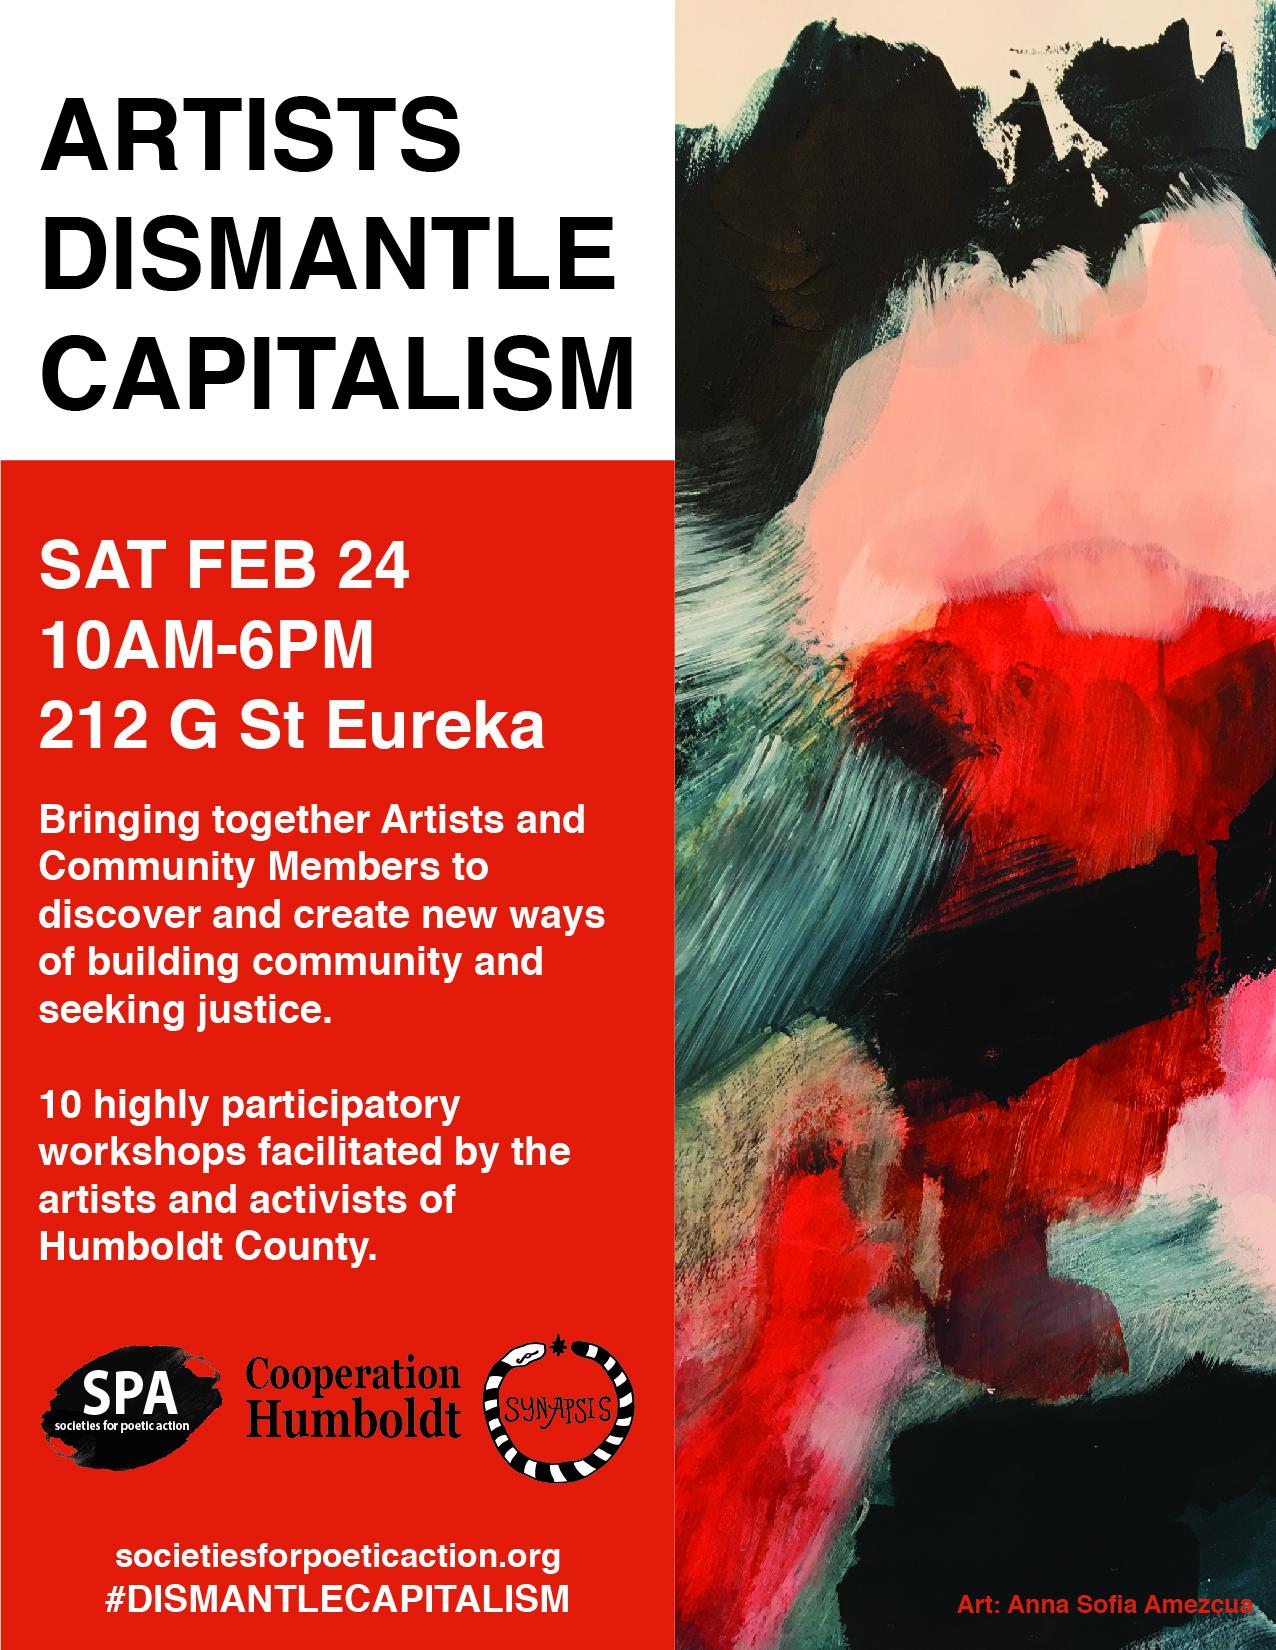 artist dismantle capitalism posters-01.jpg